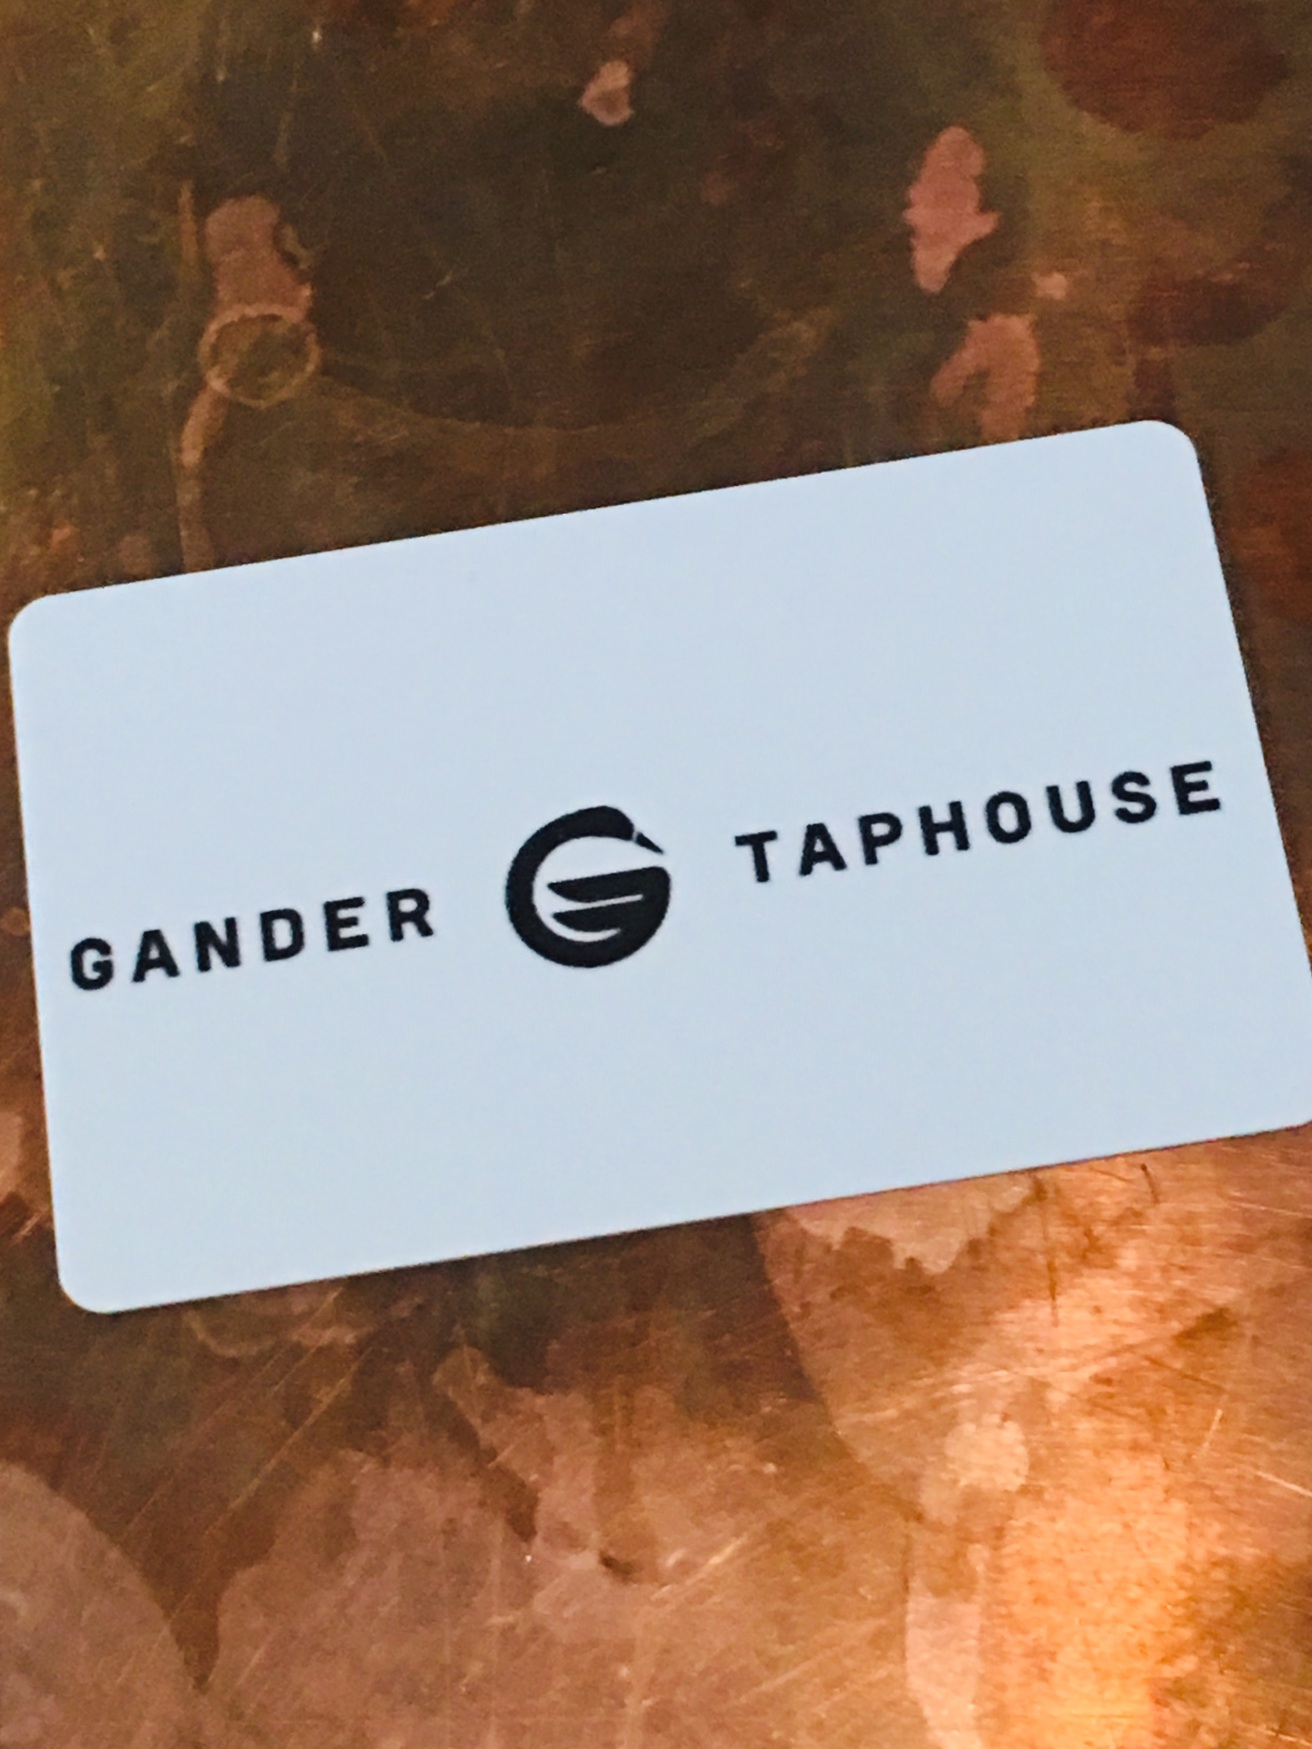 Gander+Taphouse+Gift+Card